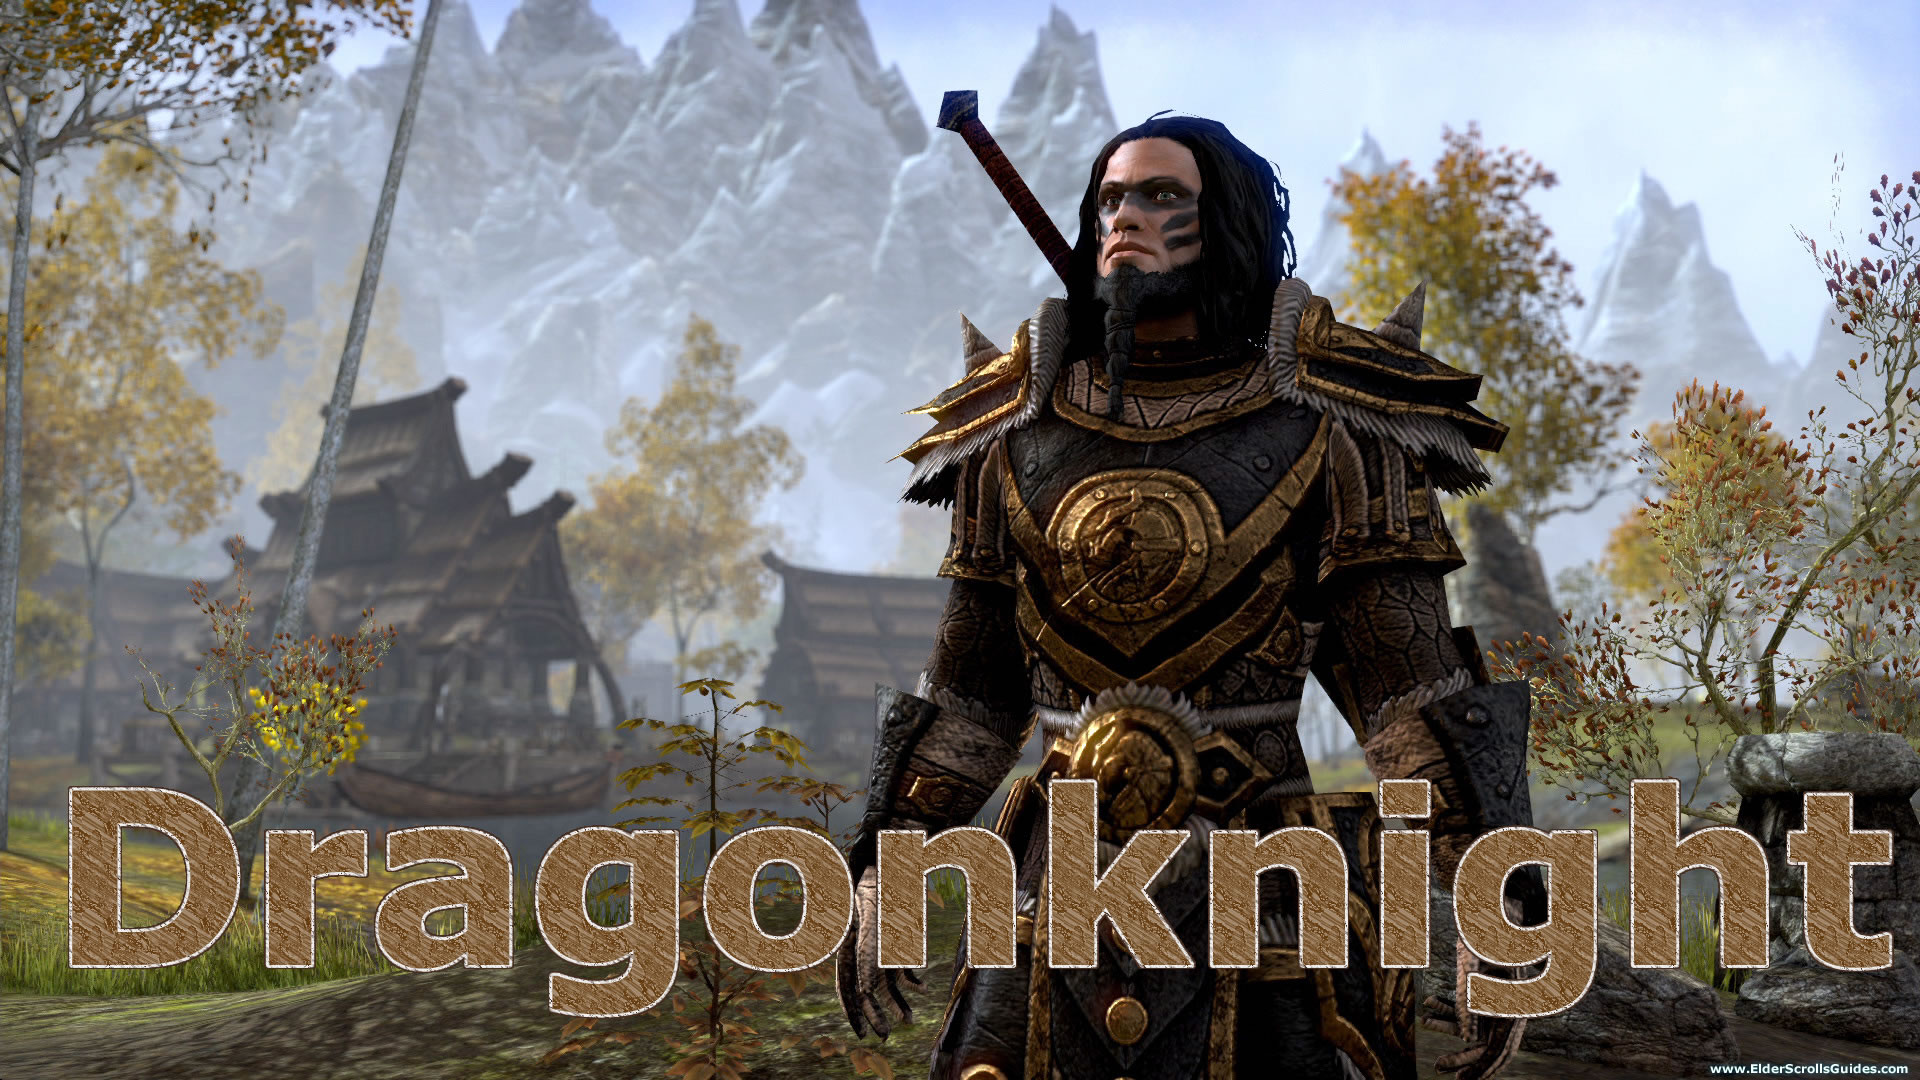 Dragonknight Class Guide | Elder Scrolls Online Guides